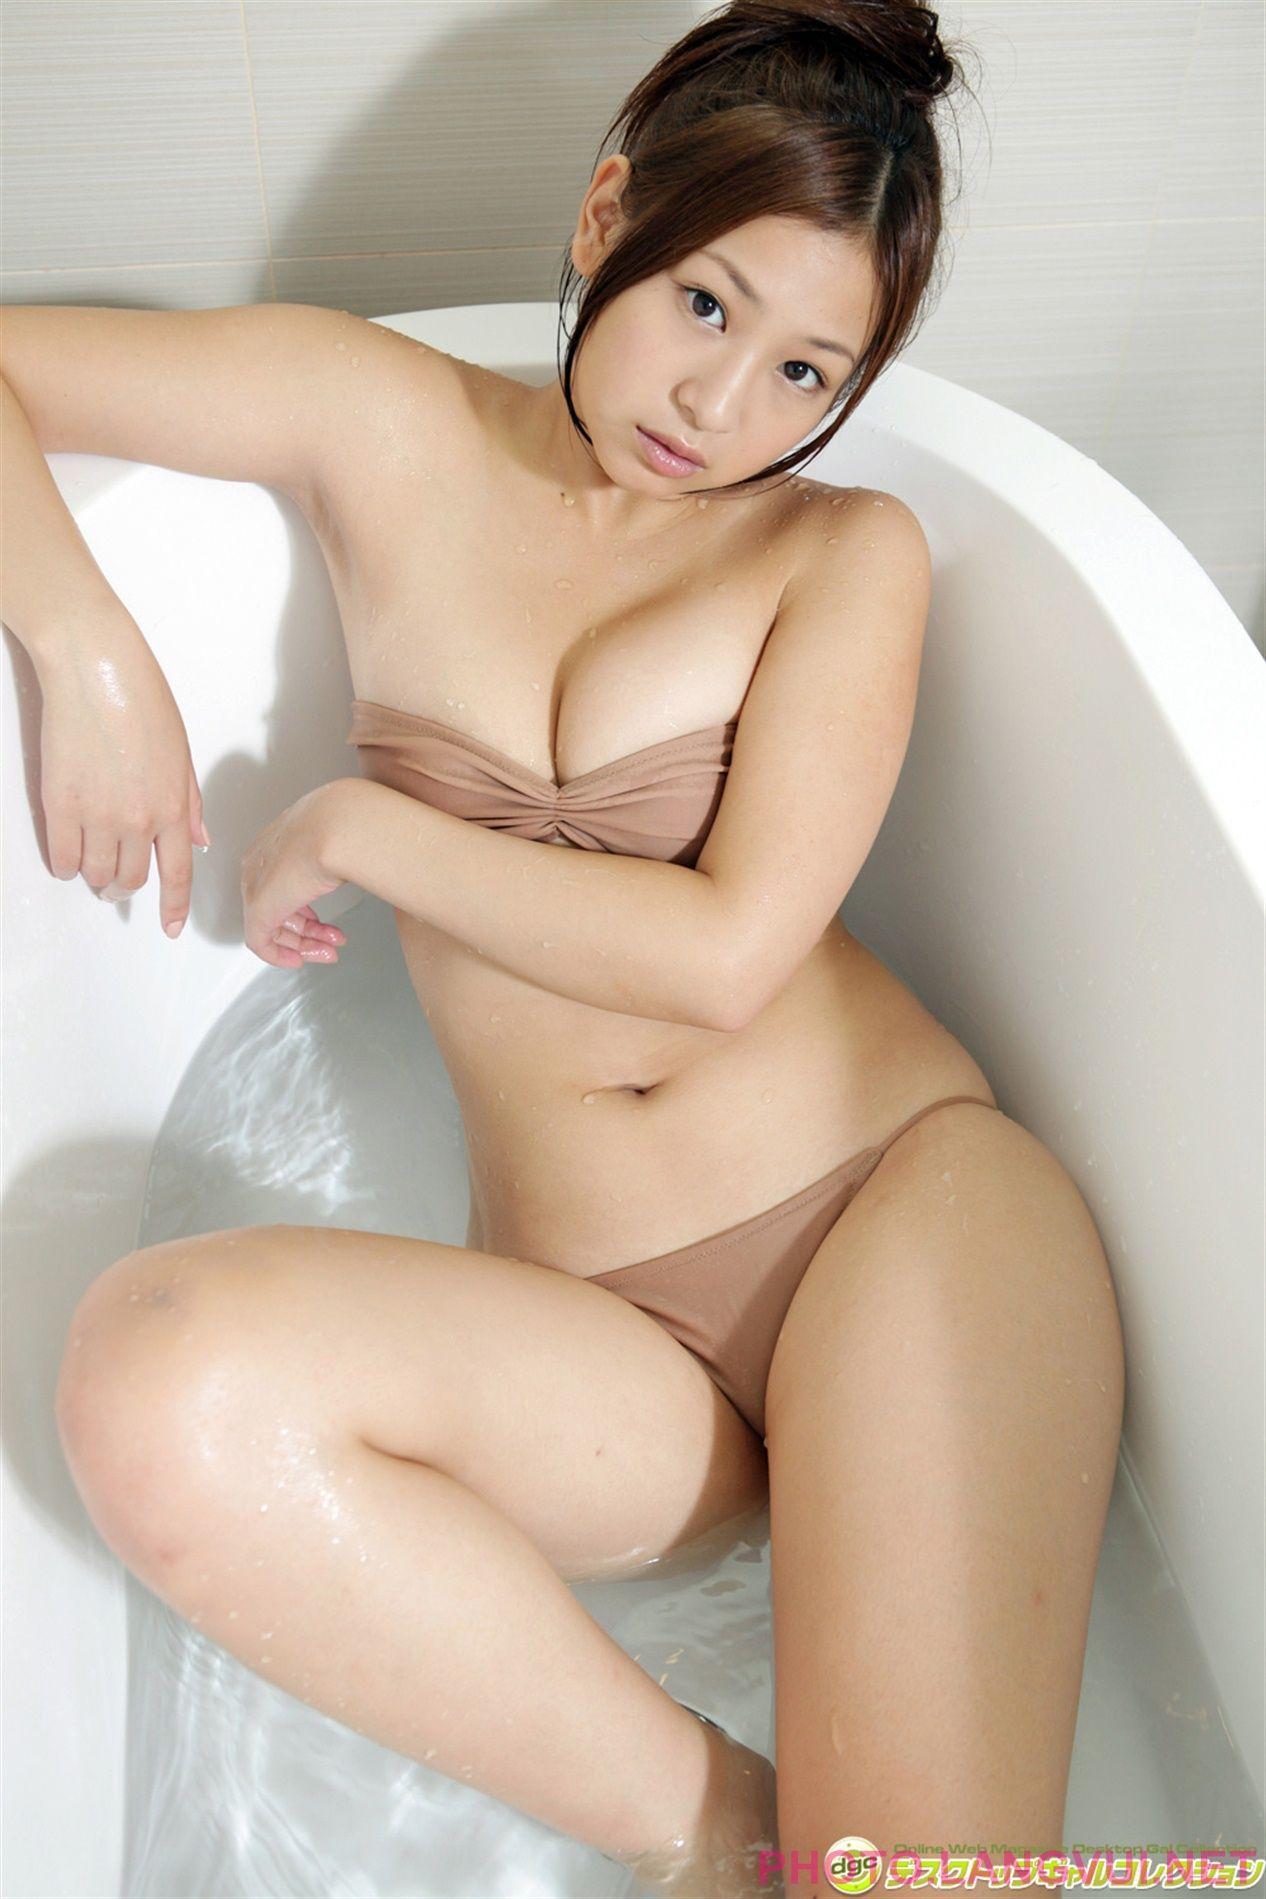 beautiful nude ladies